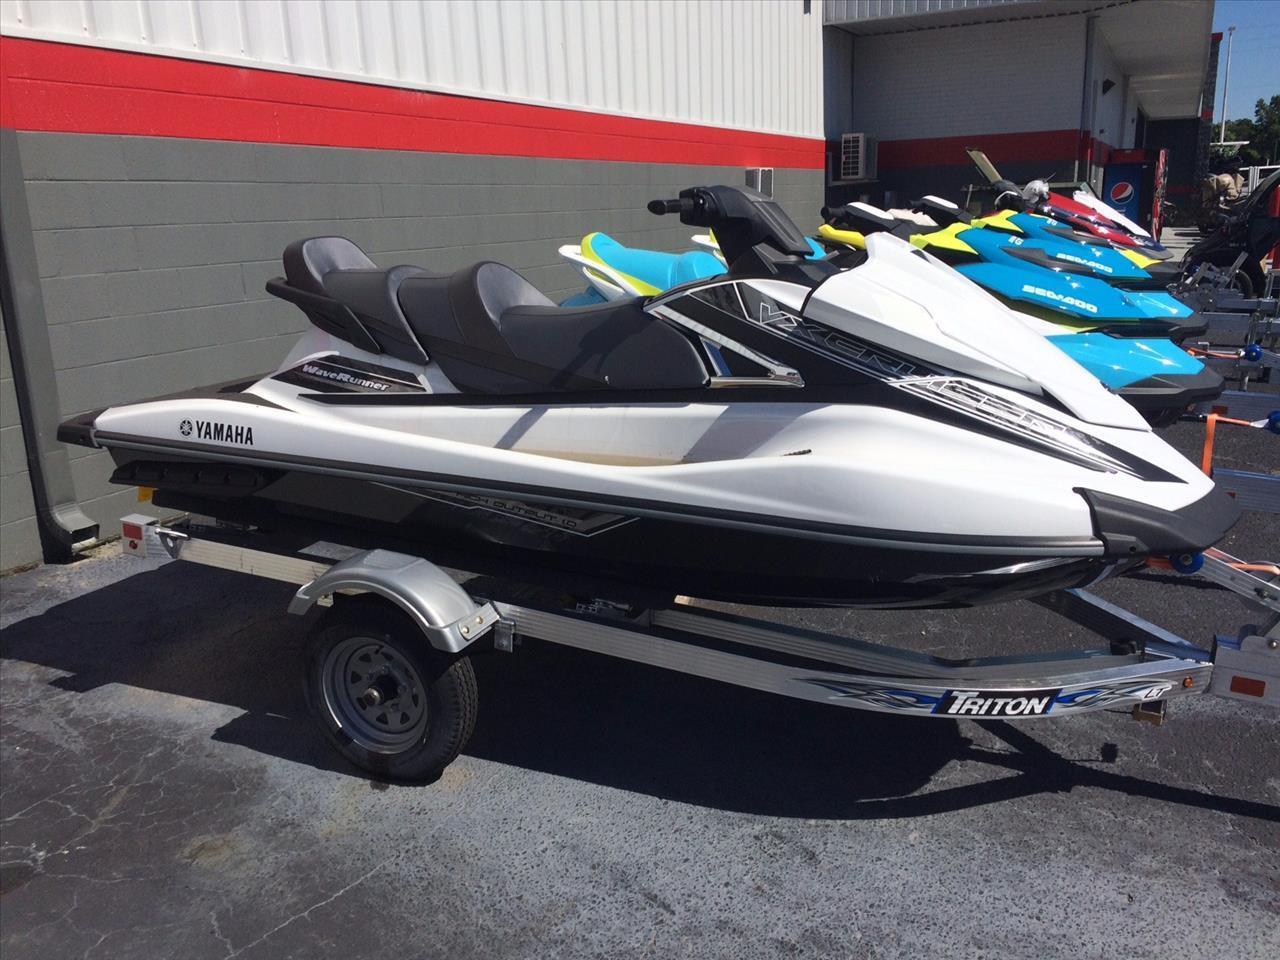 2016 Yamaha VX Cruiser for sale at Vehicle Network, LLC - Performance East, INC. in Goldsboro NC